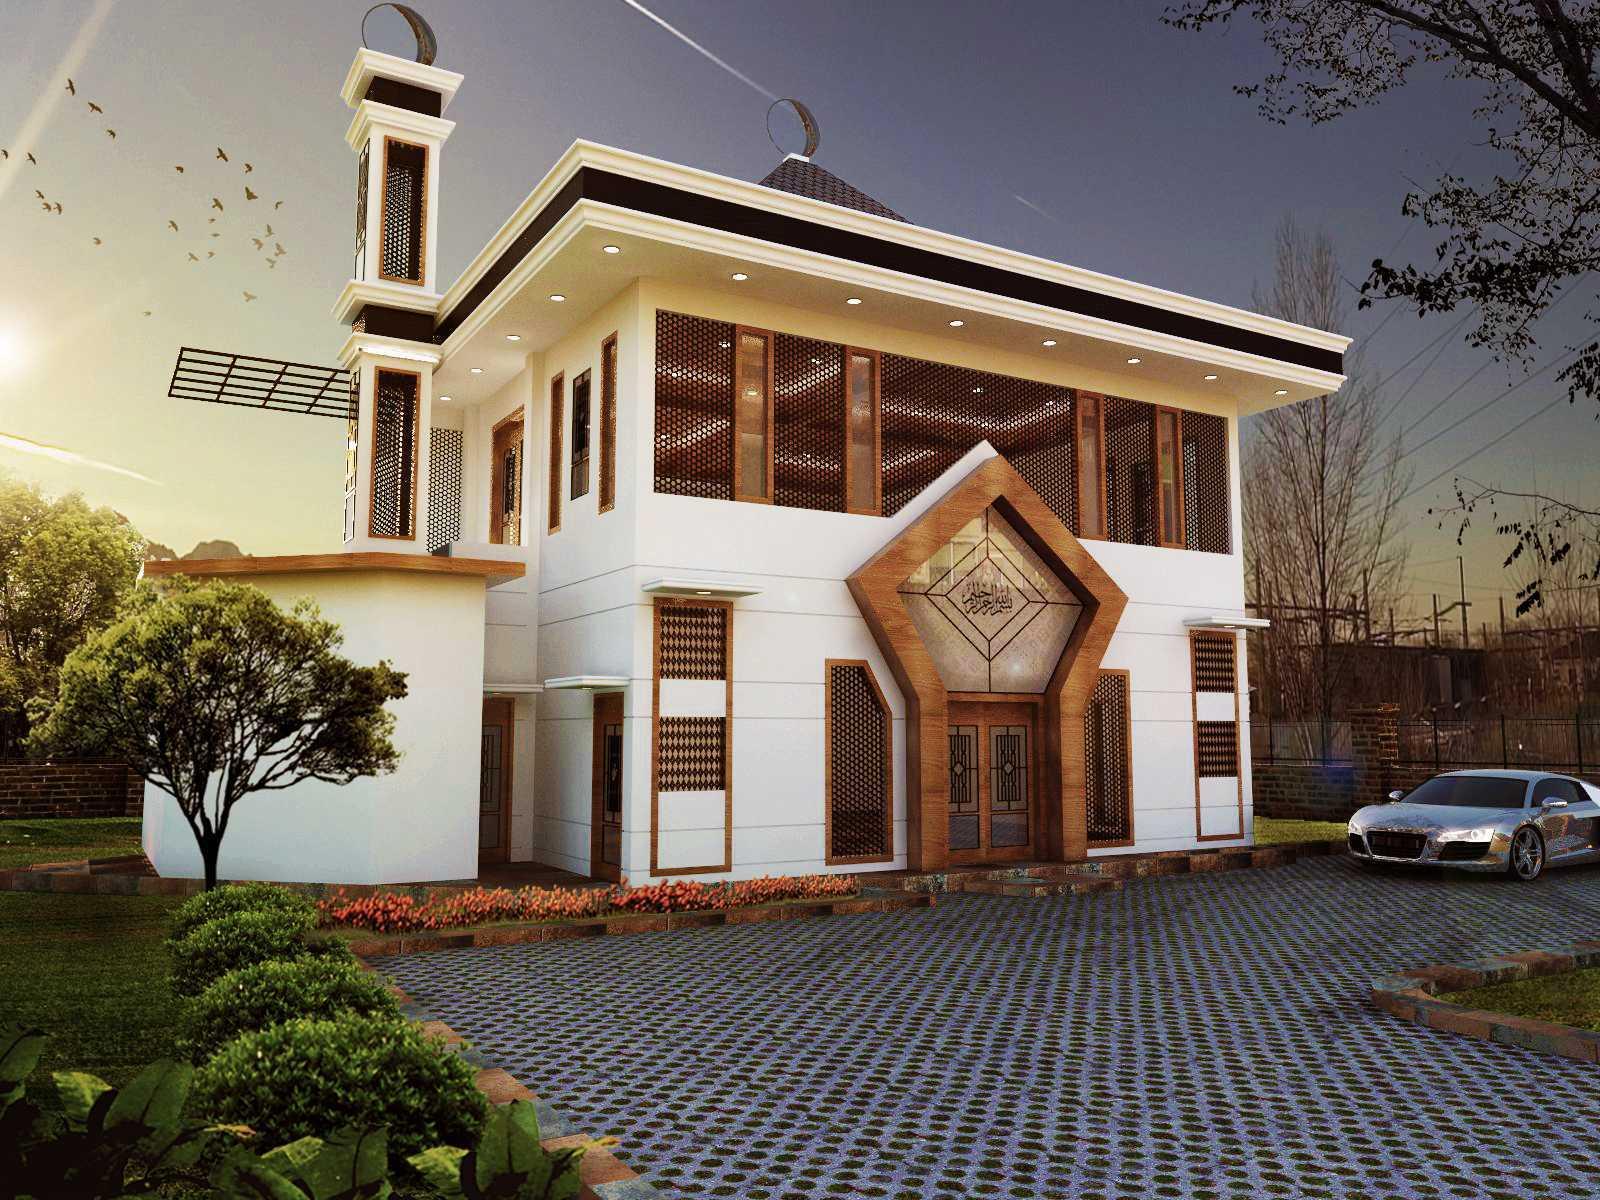 Rinto Katili, S.s.n, M.m Masjid  Al_Azhar 1   Exterior View 1 Kontemporer  32622